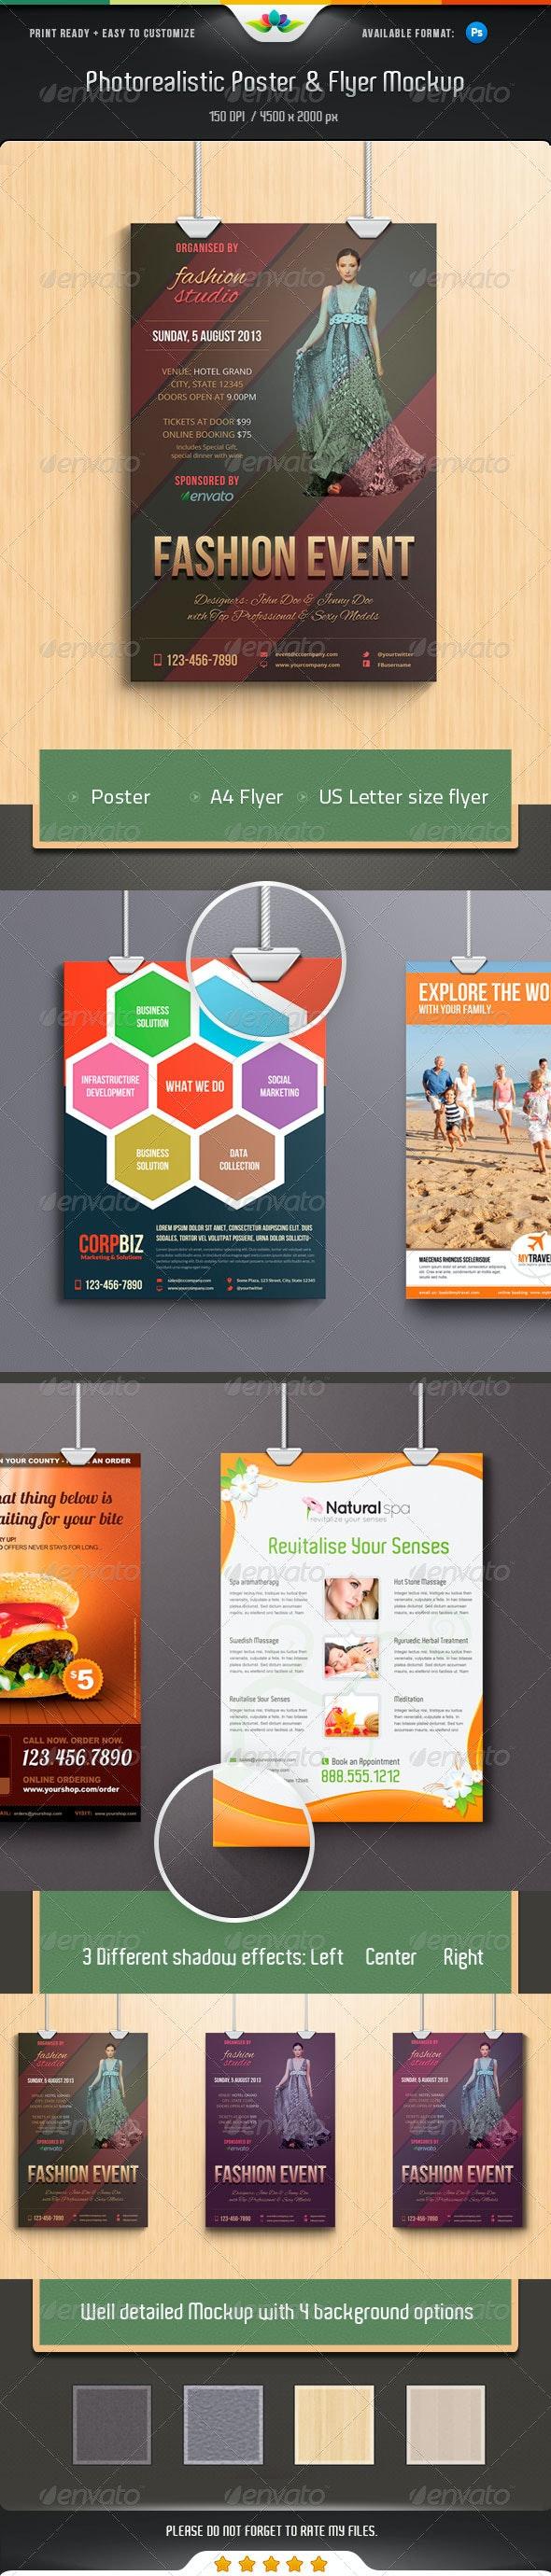 Photorealistic Poster & Flyer Mockup Pack - Print Product Mock-Ups